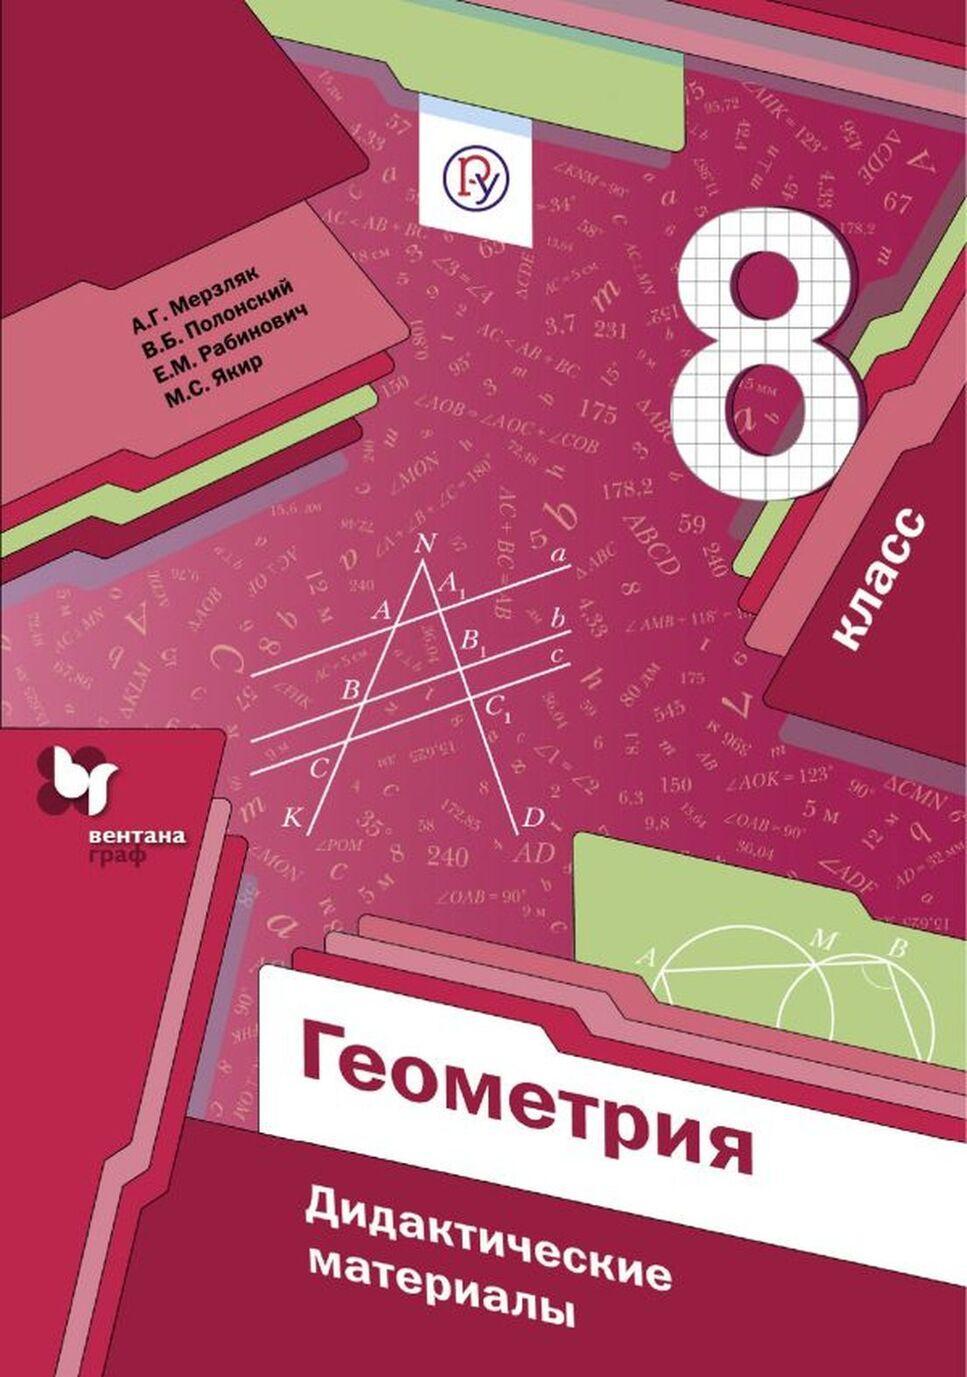 Geometrija. 8klass. Didakticheskie materialy | Merzljak Arkadij Grigorevich, Jakir Mikhail Semenovich